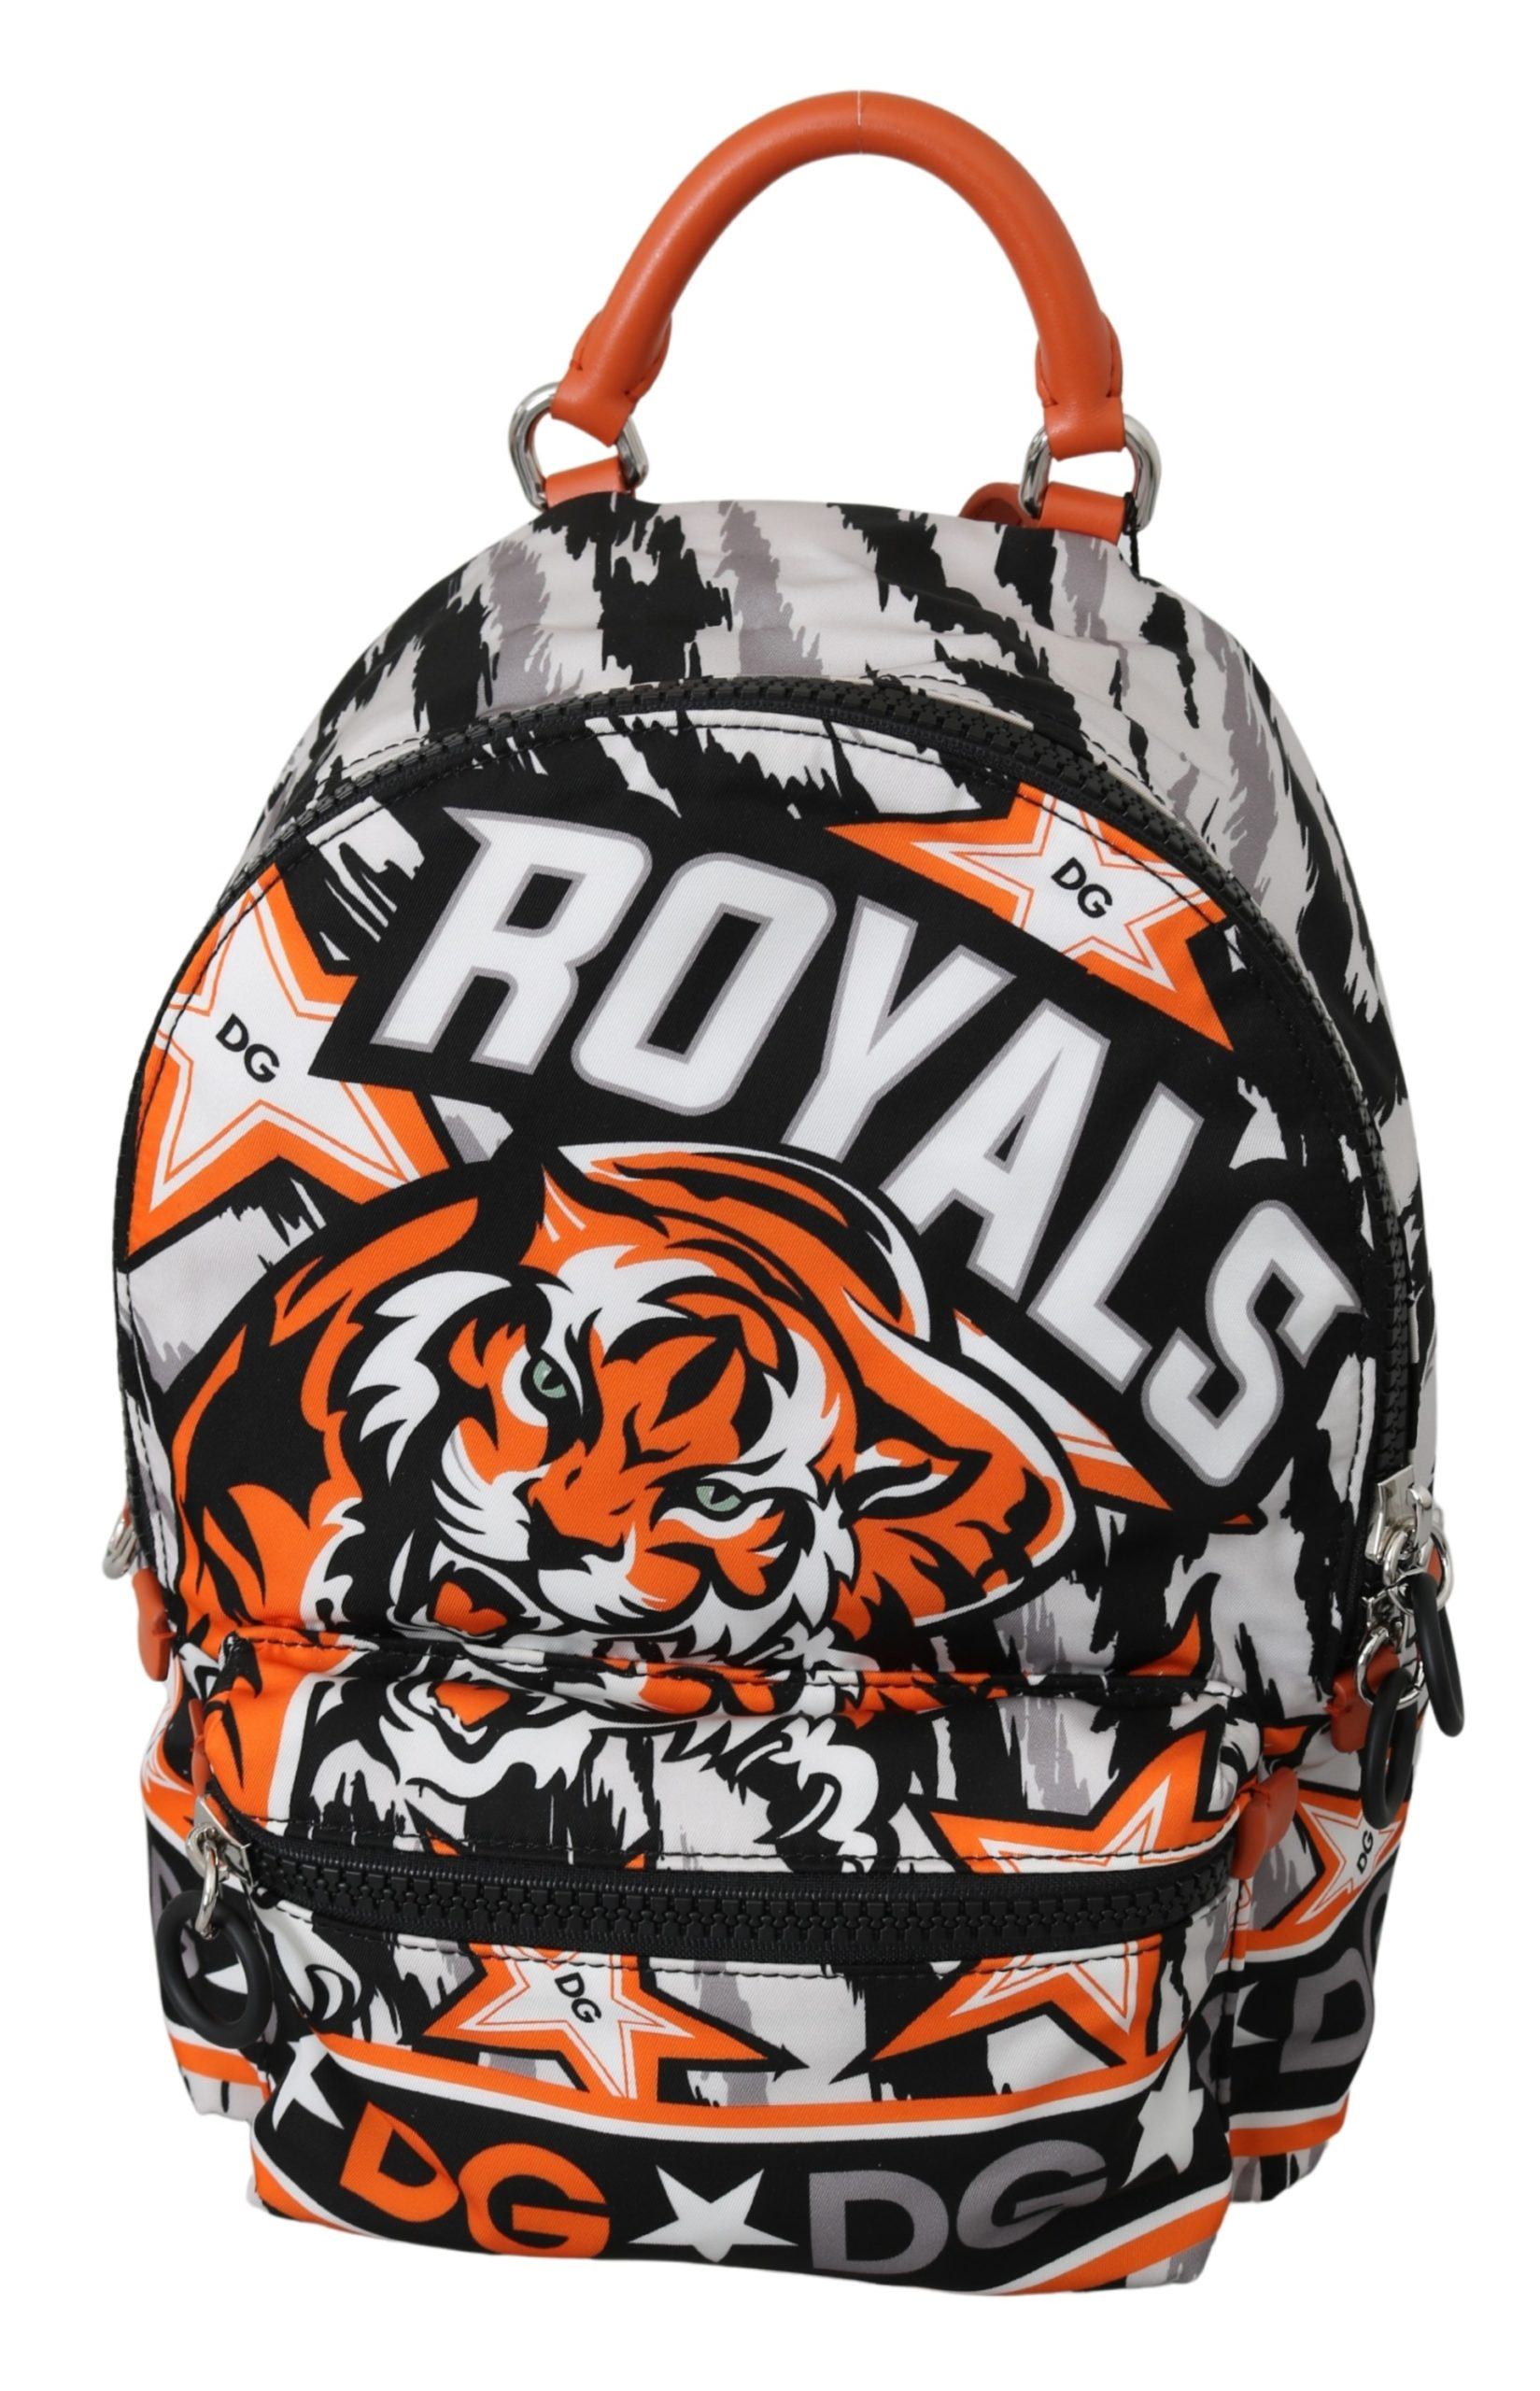 Dolce & Gabbana Men's Tiger Print Casual School Backpack Multicolor VAS10042